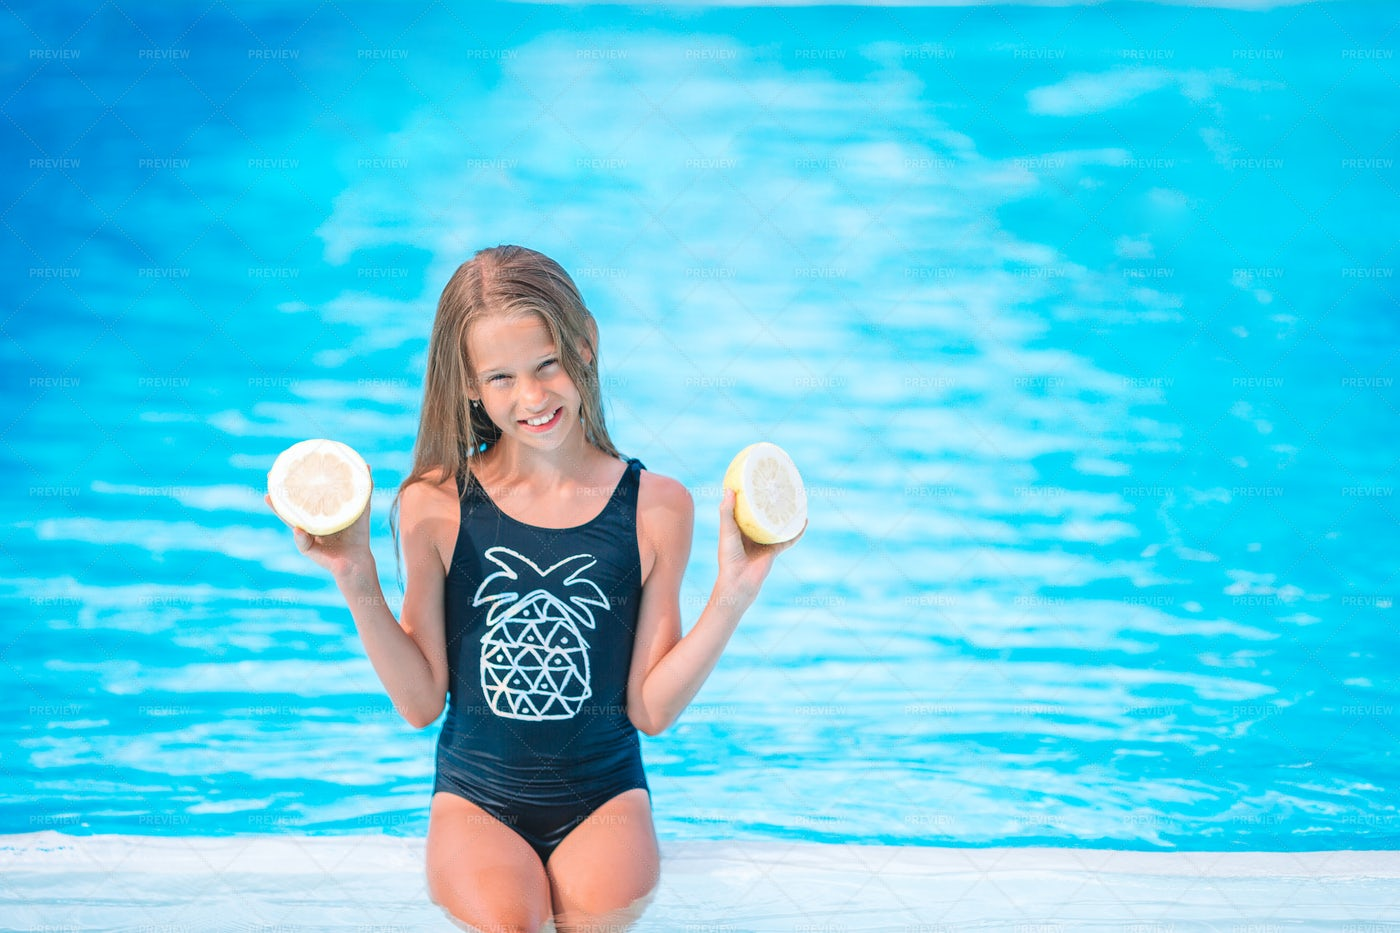 Swimming Break With Lemons: Stock Photos